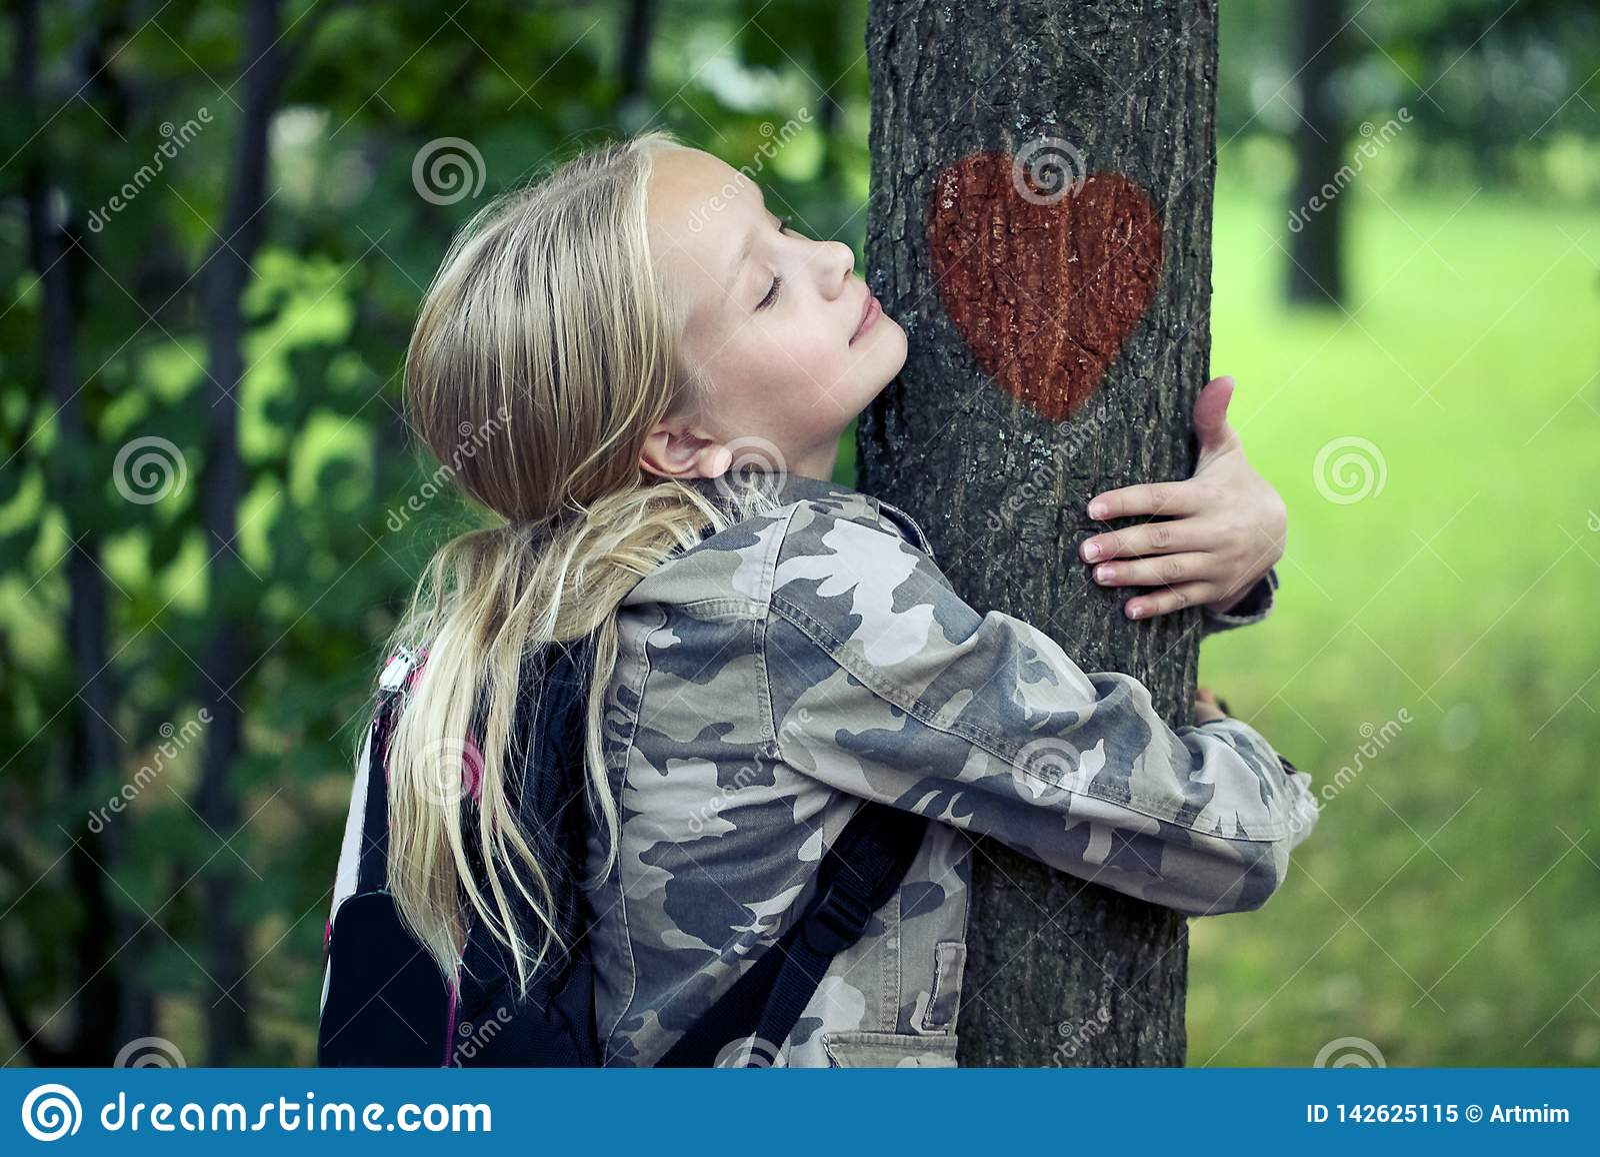 Childn που αγκαλιάζει το δέντρο Υπαίθρια φύση προστασίας του περιβάλλοντος Συντήρηση υπαίθρια